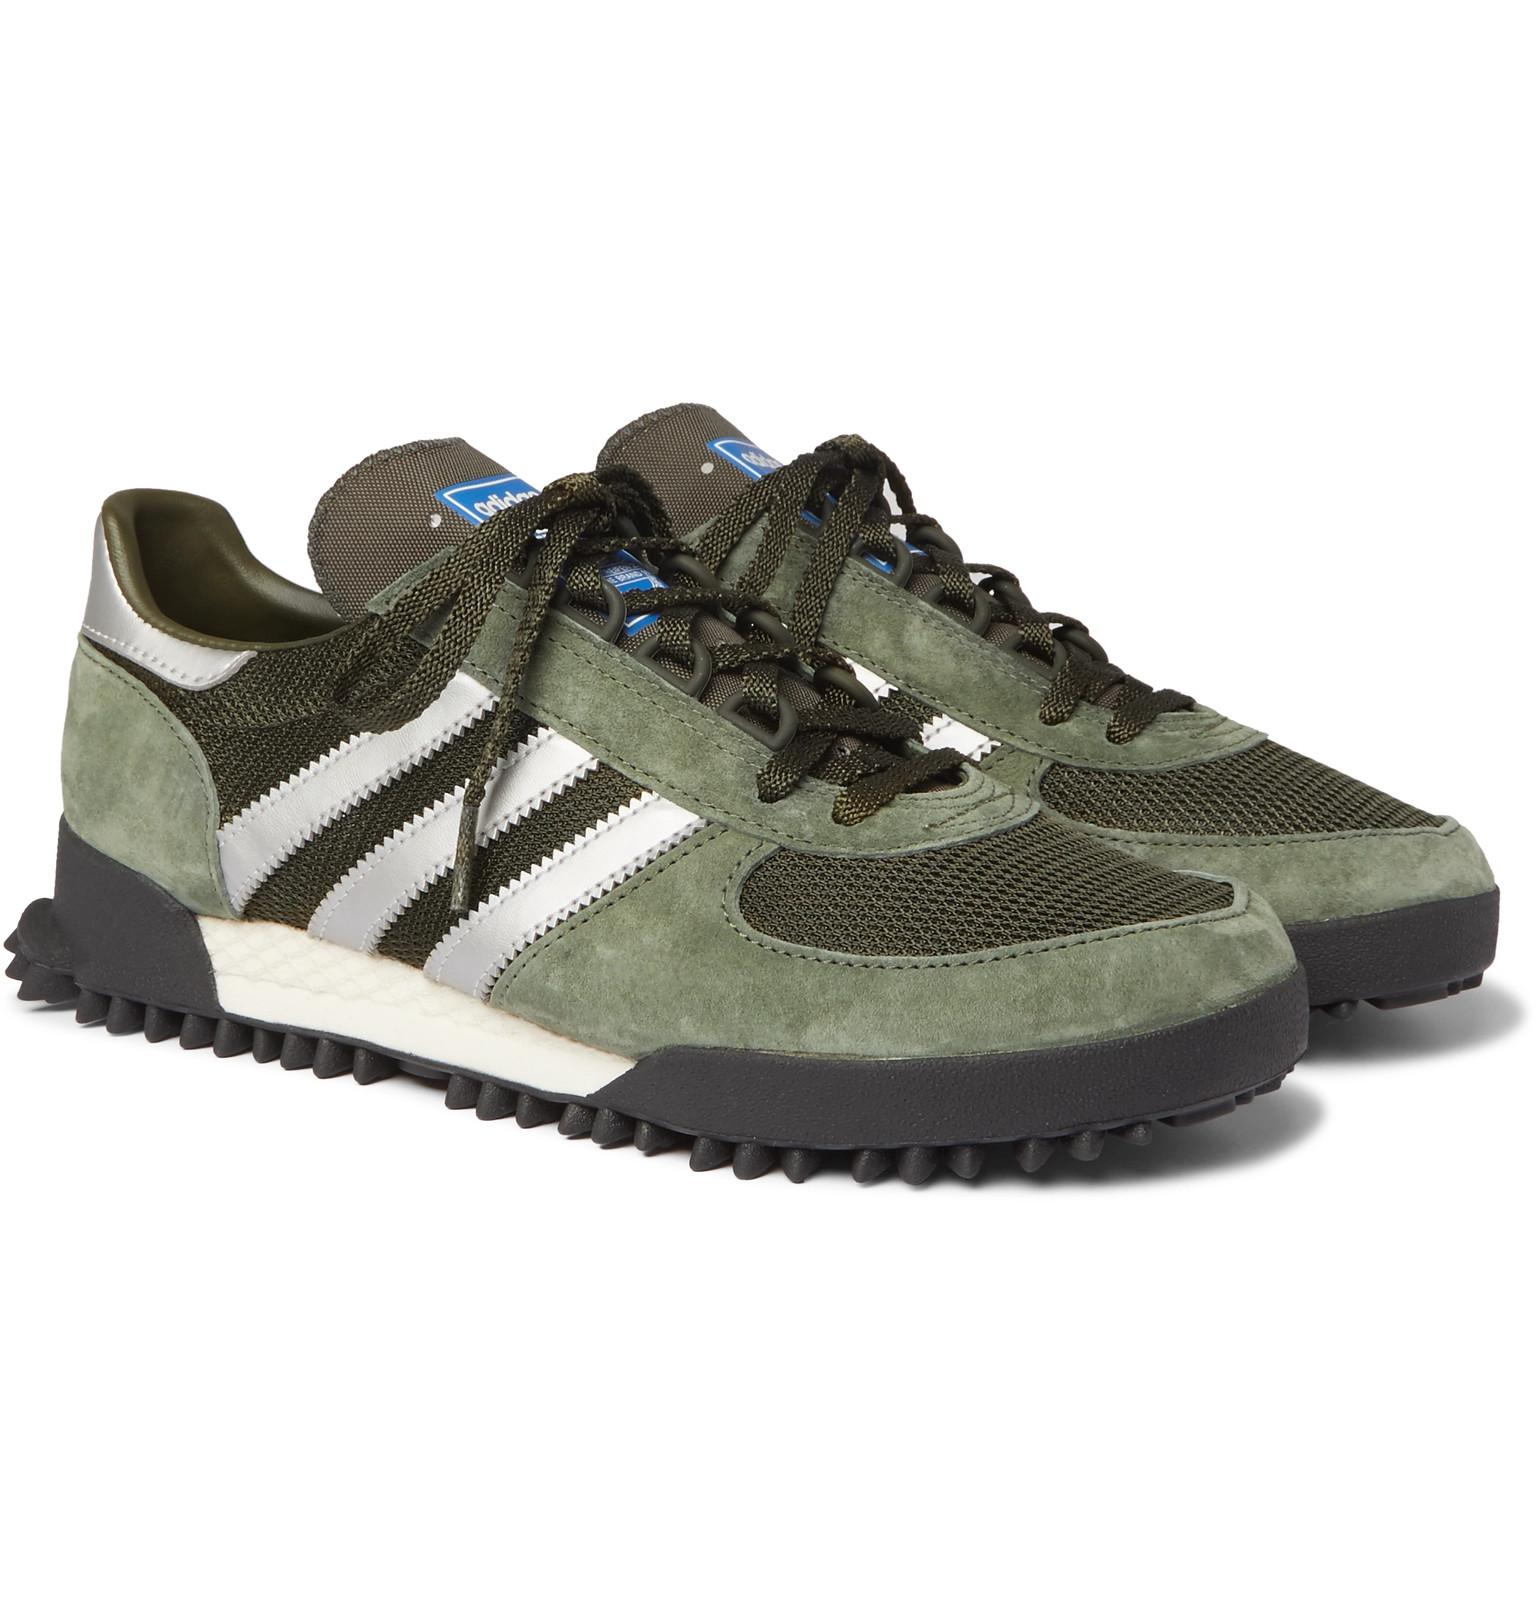 Marathon Tr Mesh, Suede And Leather Sneakers adidas Originals